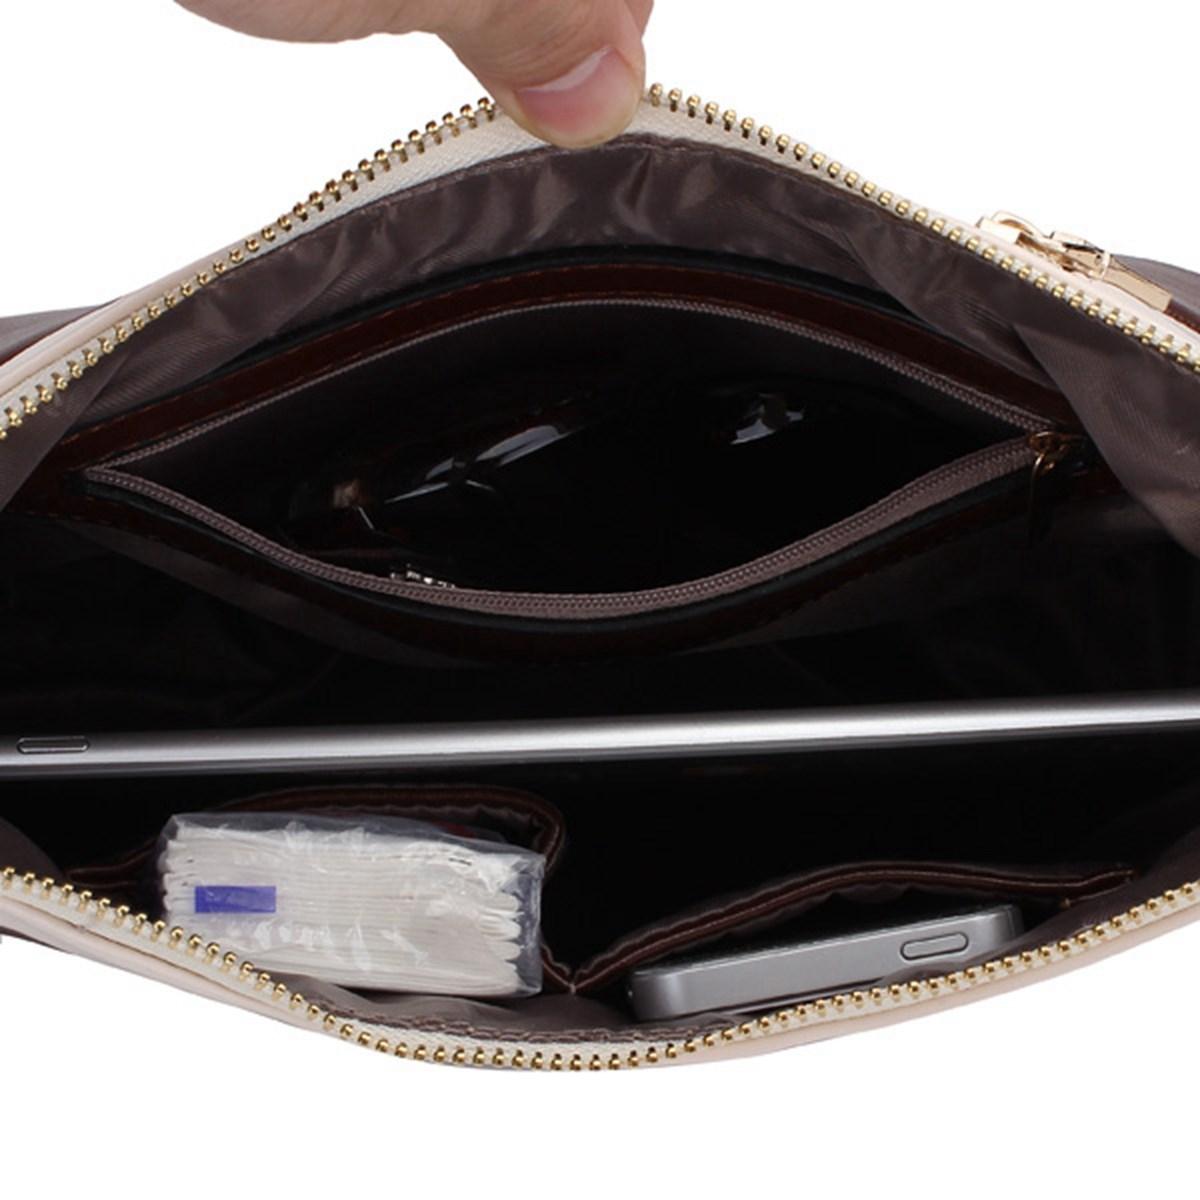 5fb59e6943 Search Results Pusheen The Cat Messenger Cross Body Shoulder Bag ...